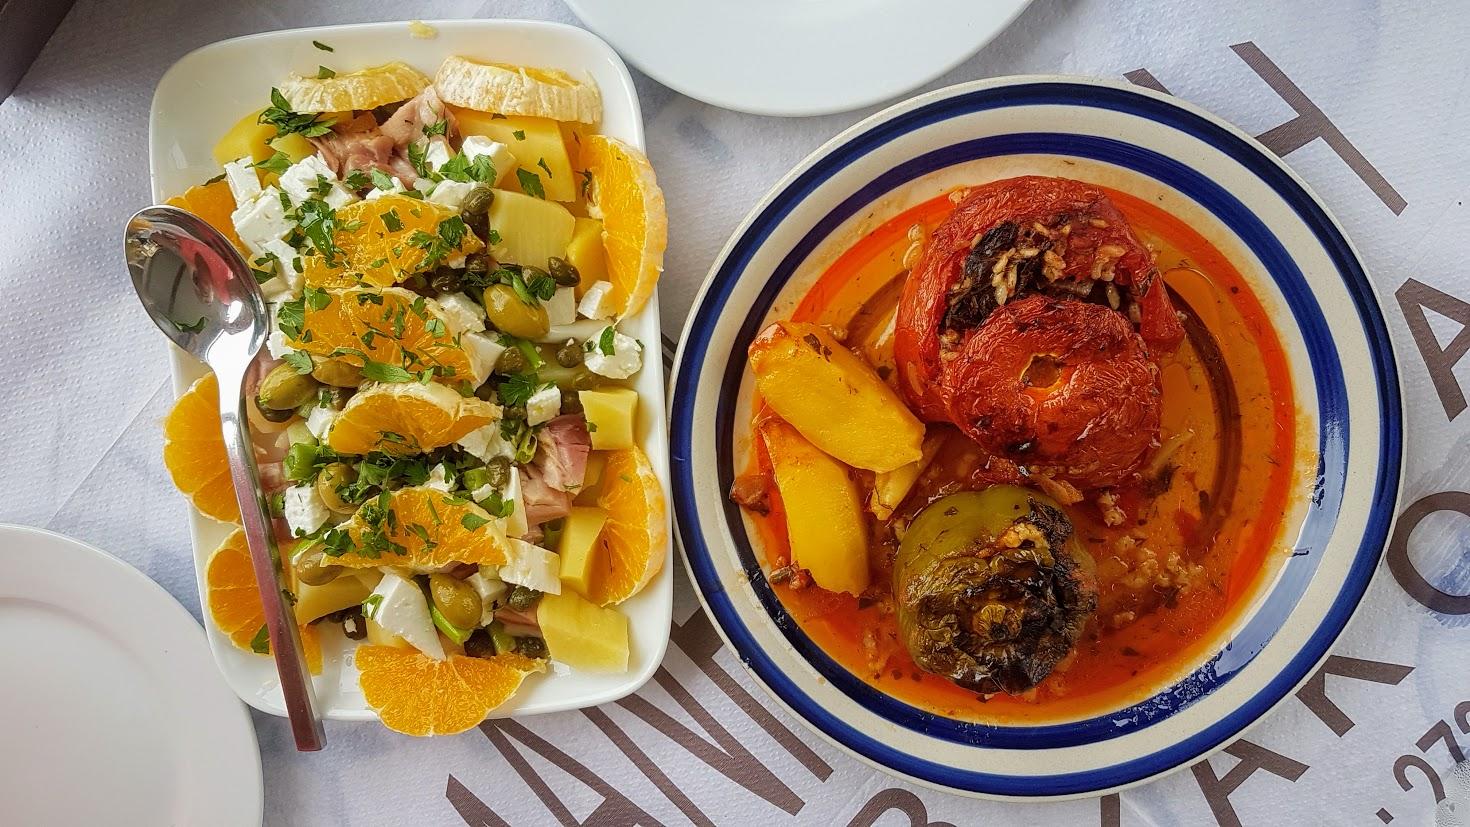 How to order Greek food